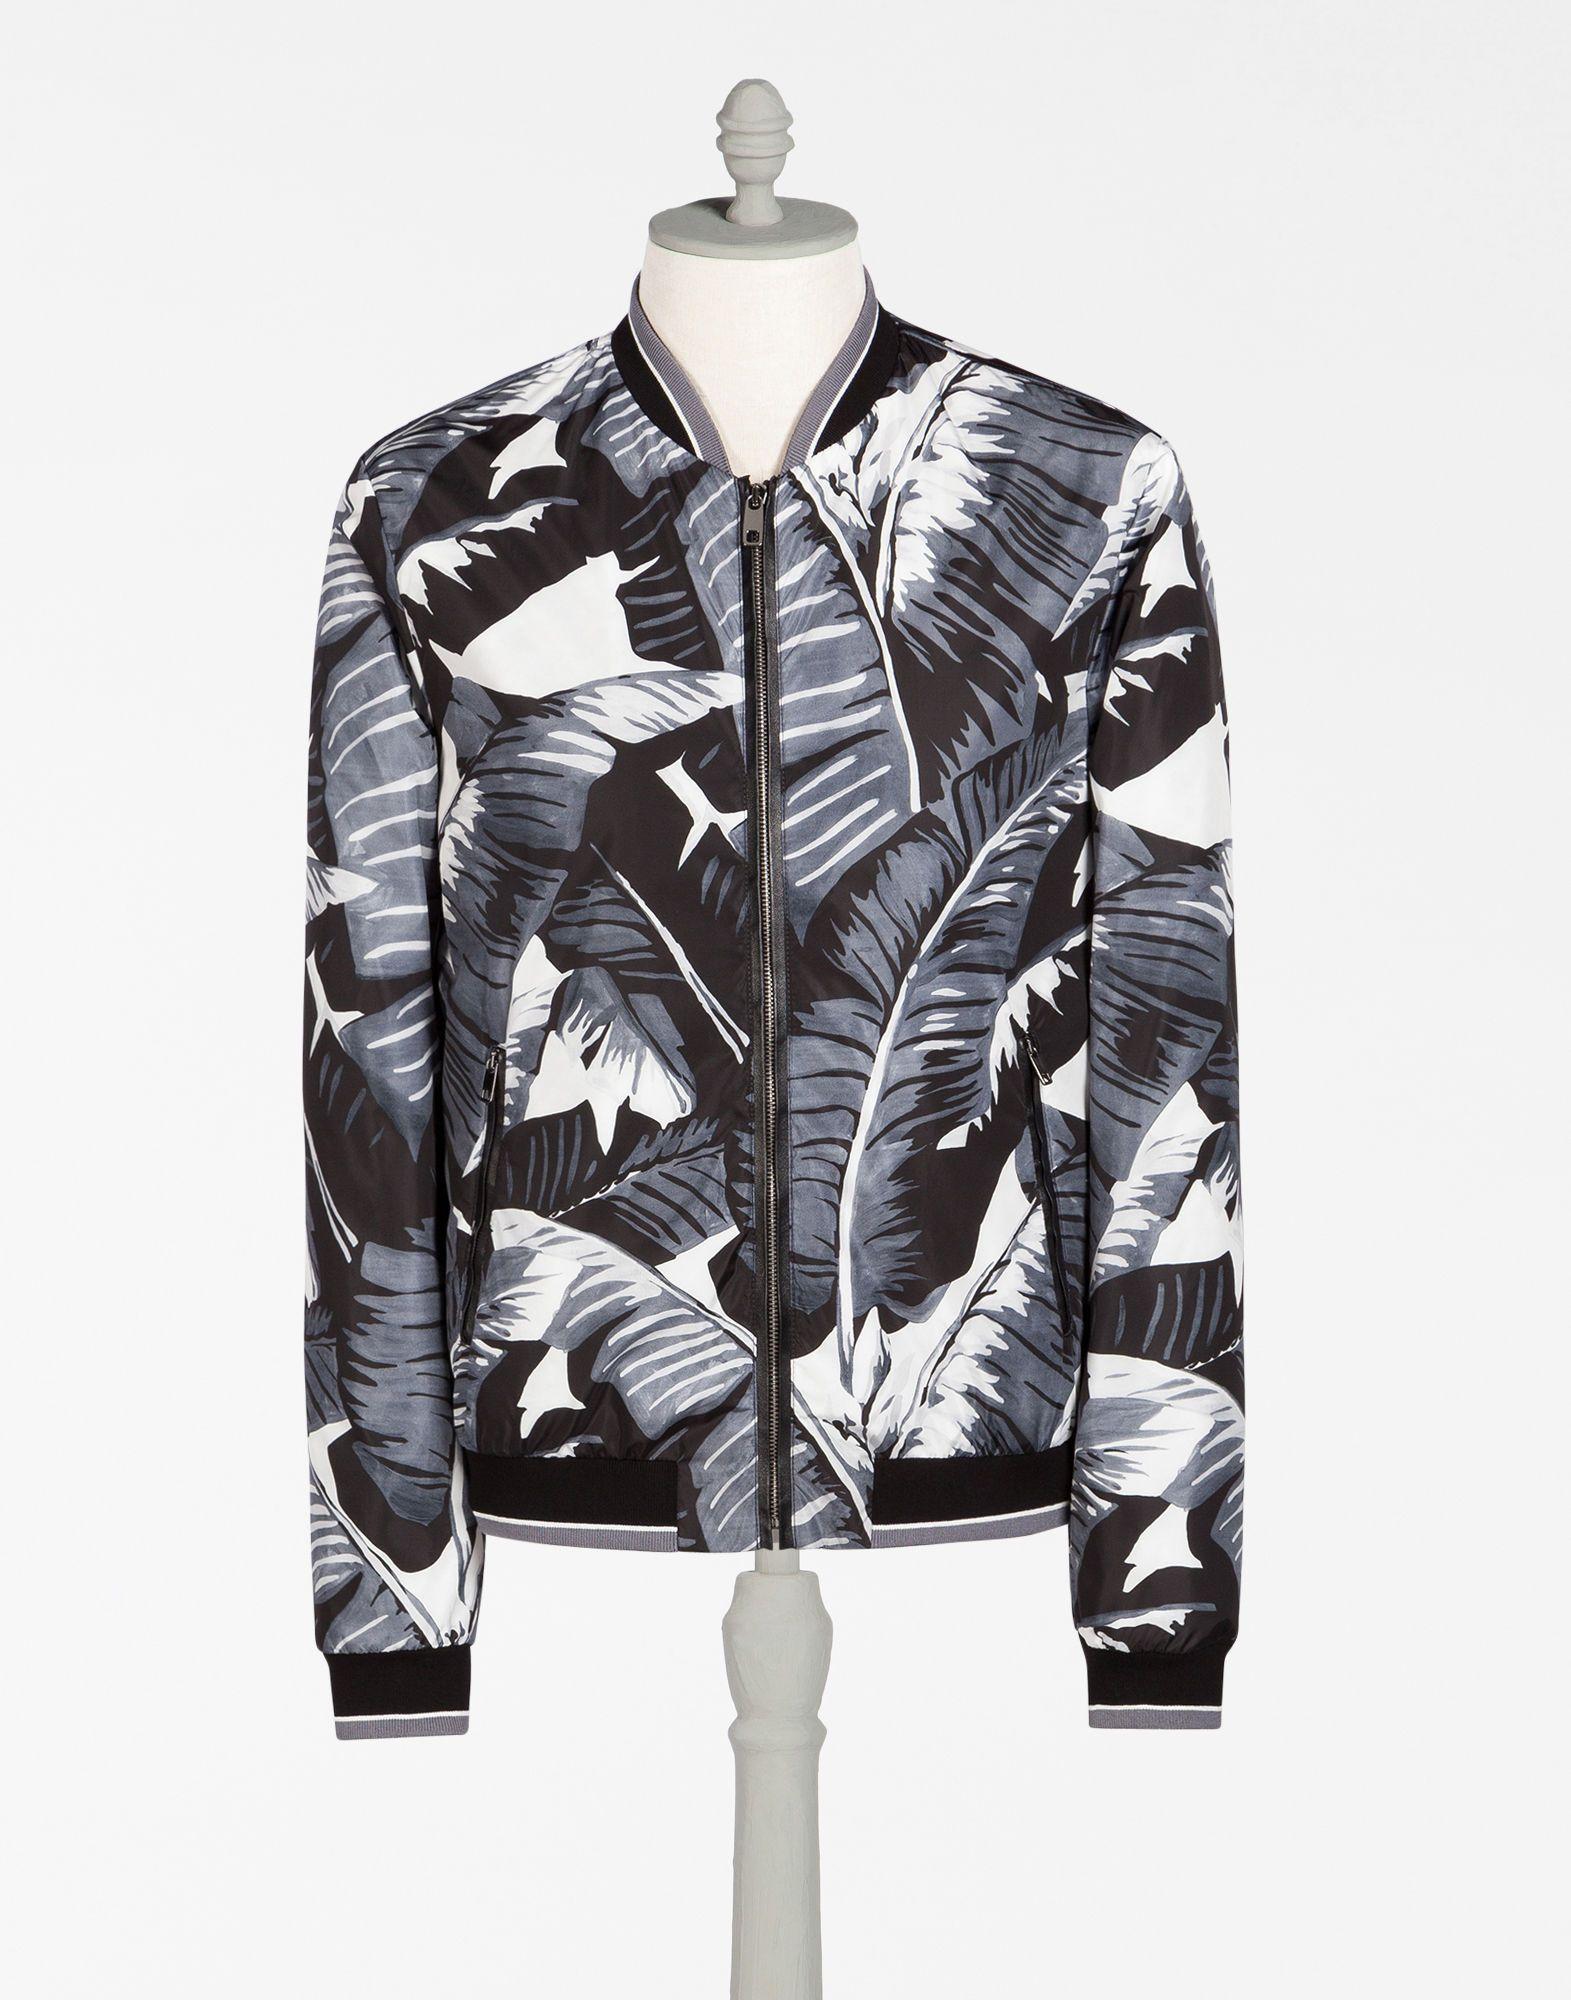 7da9c3acb DOLCE & GABBANA Bomber Jacket In Printed Nylon. #dolcegabbana #cloth ...